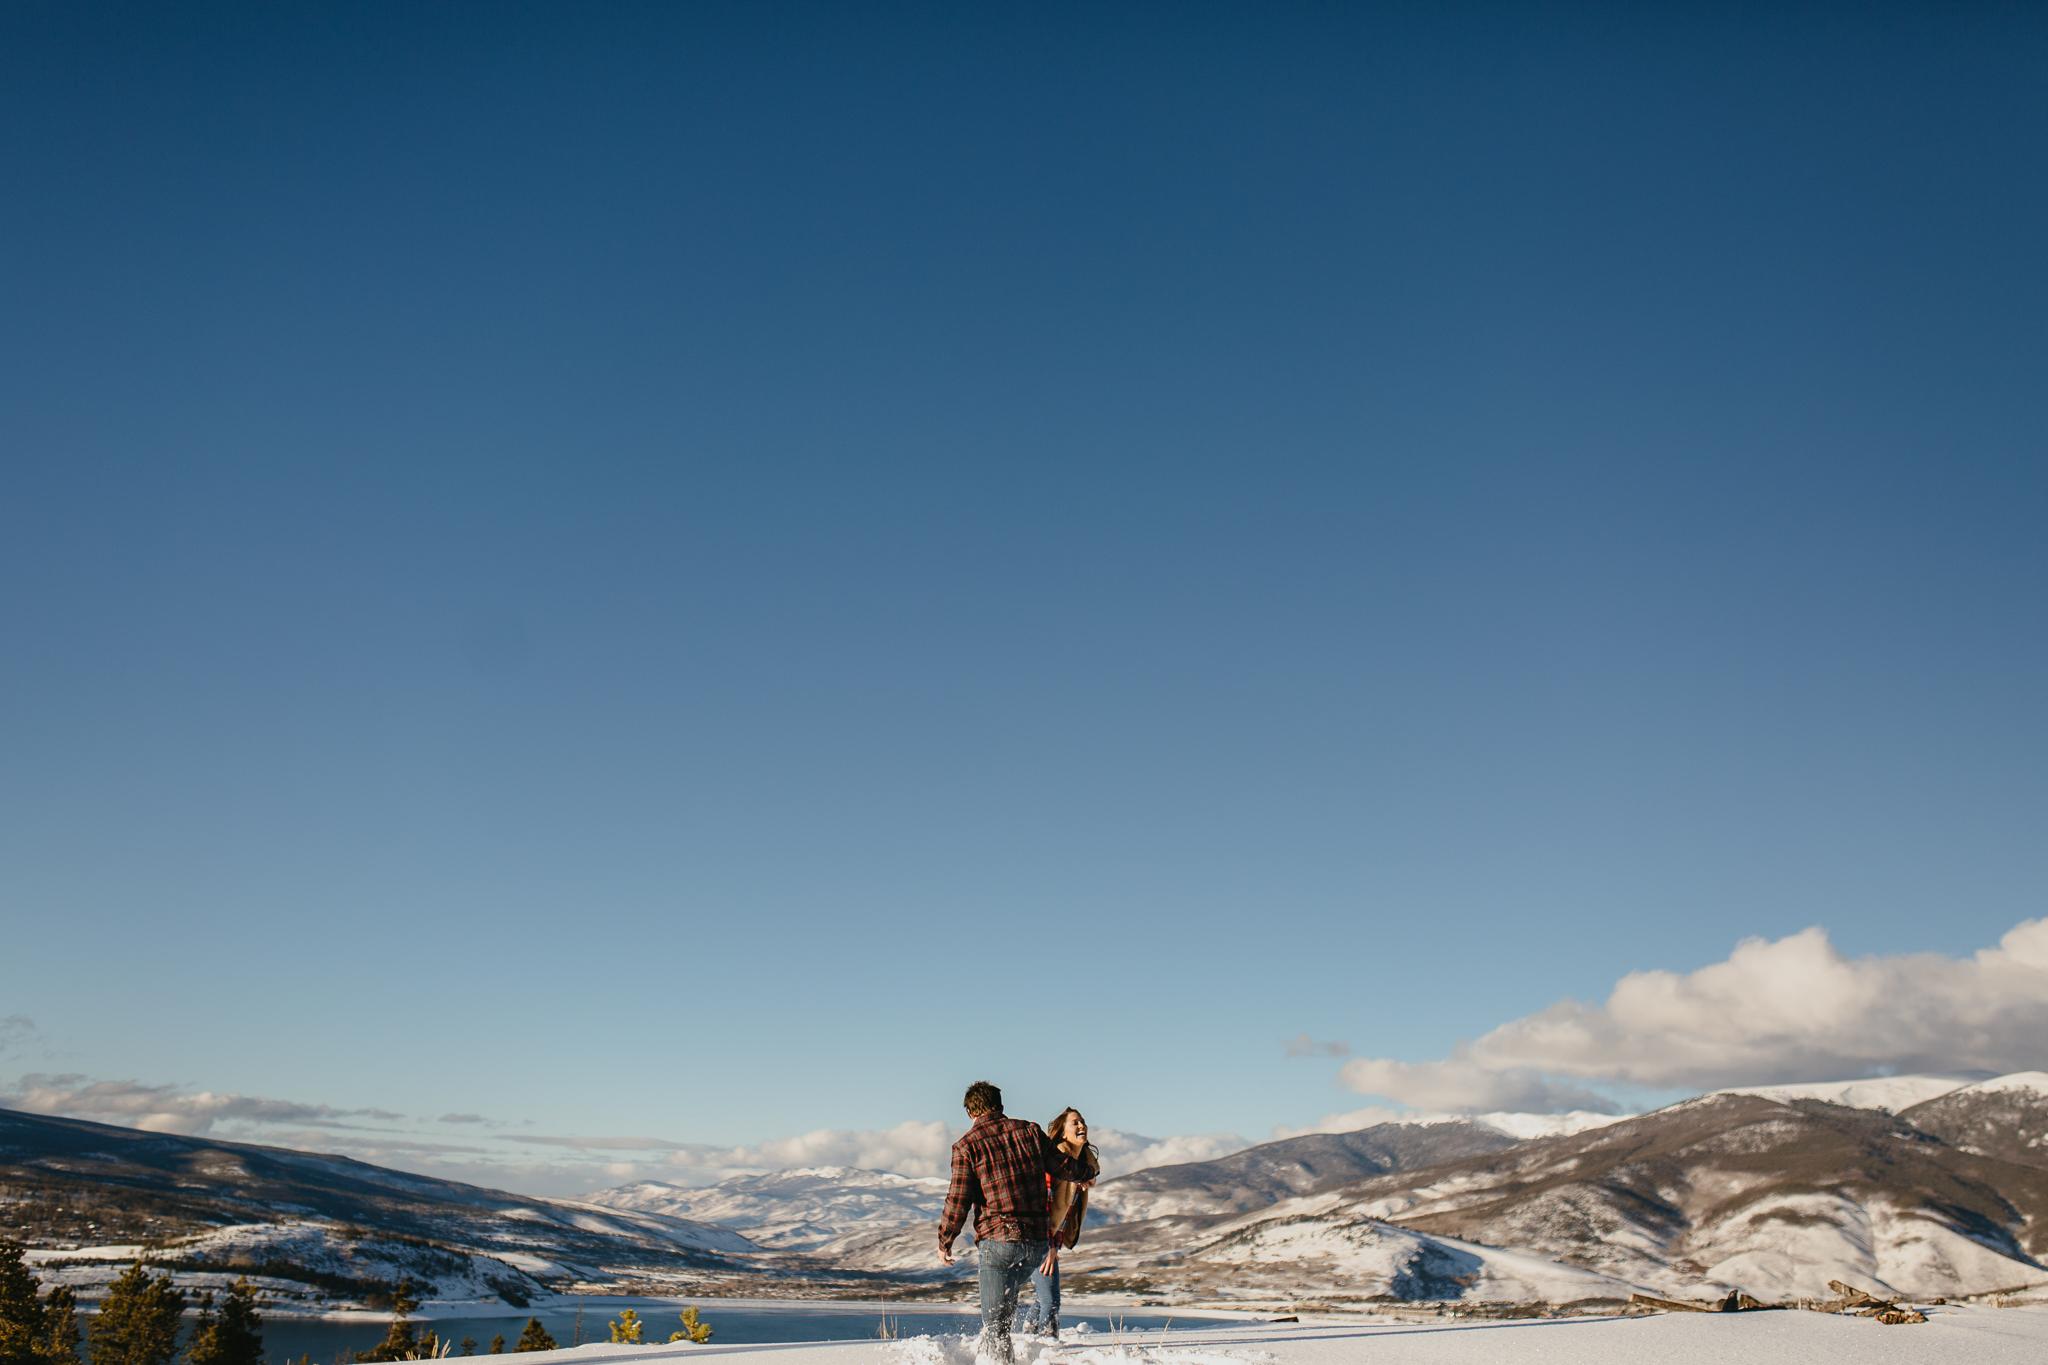 breckenridge-engagement-photography-sapphire-point-17.jpg